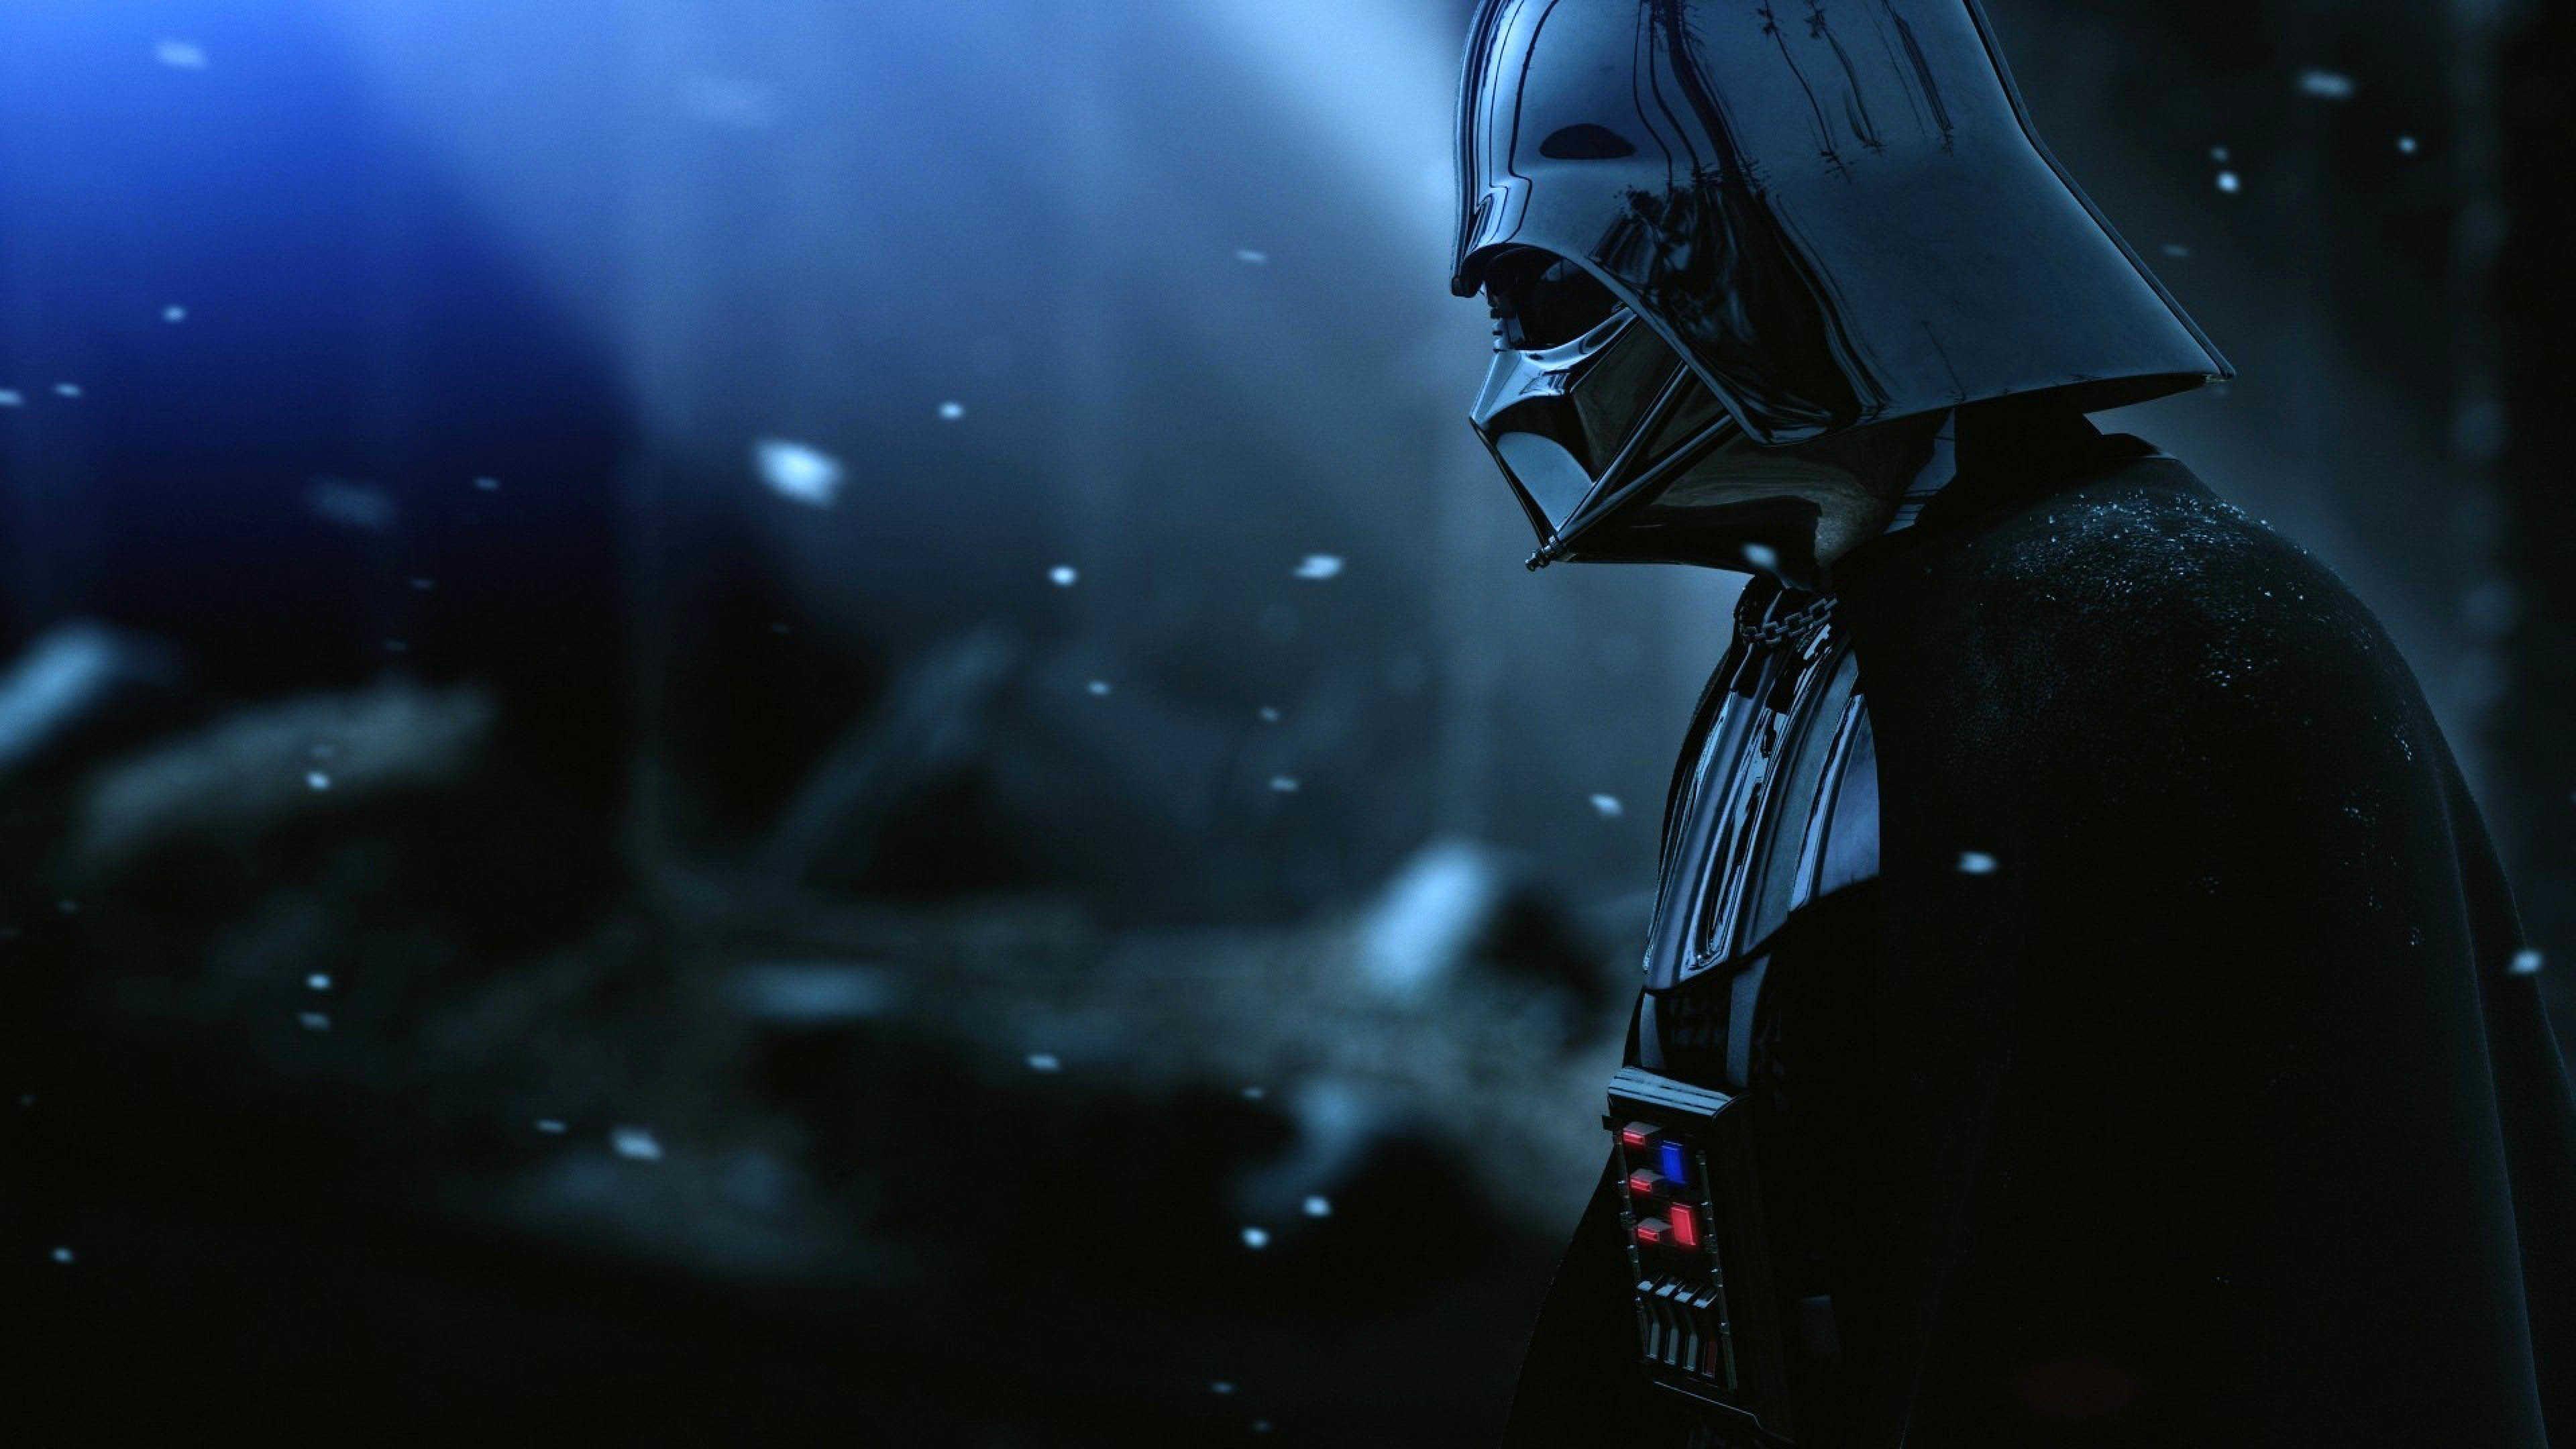 k Ultra Hd Wallpaper Star Wars